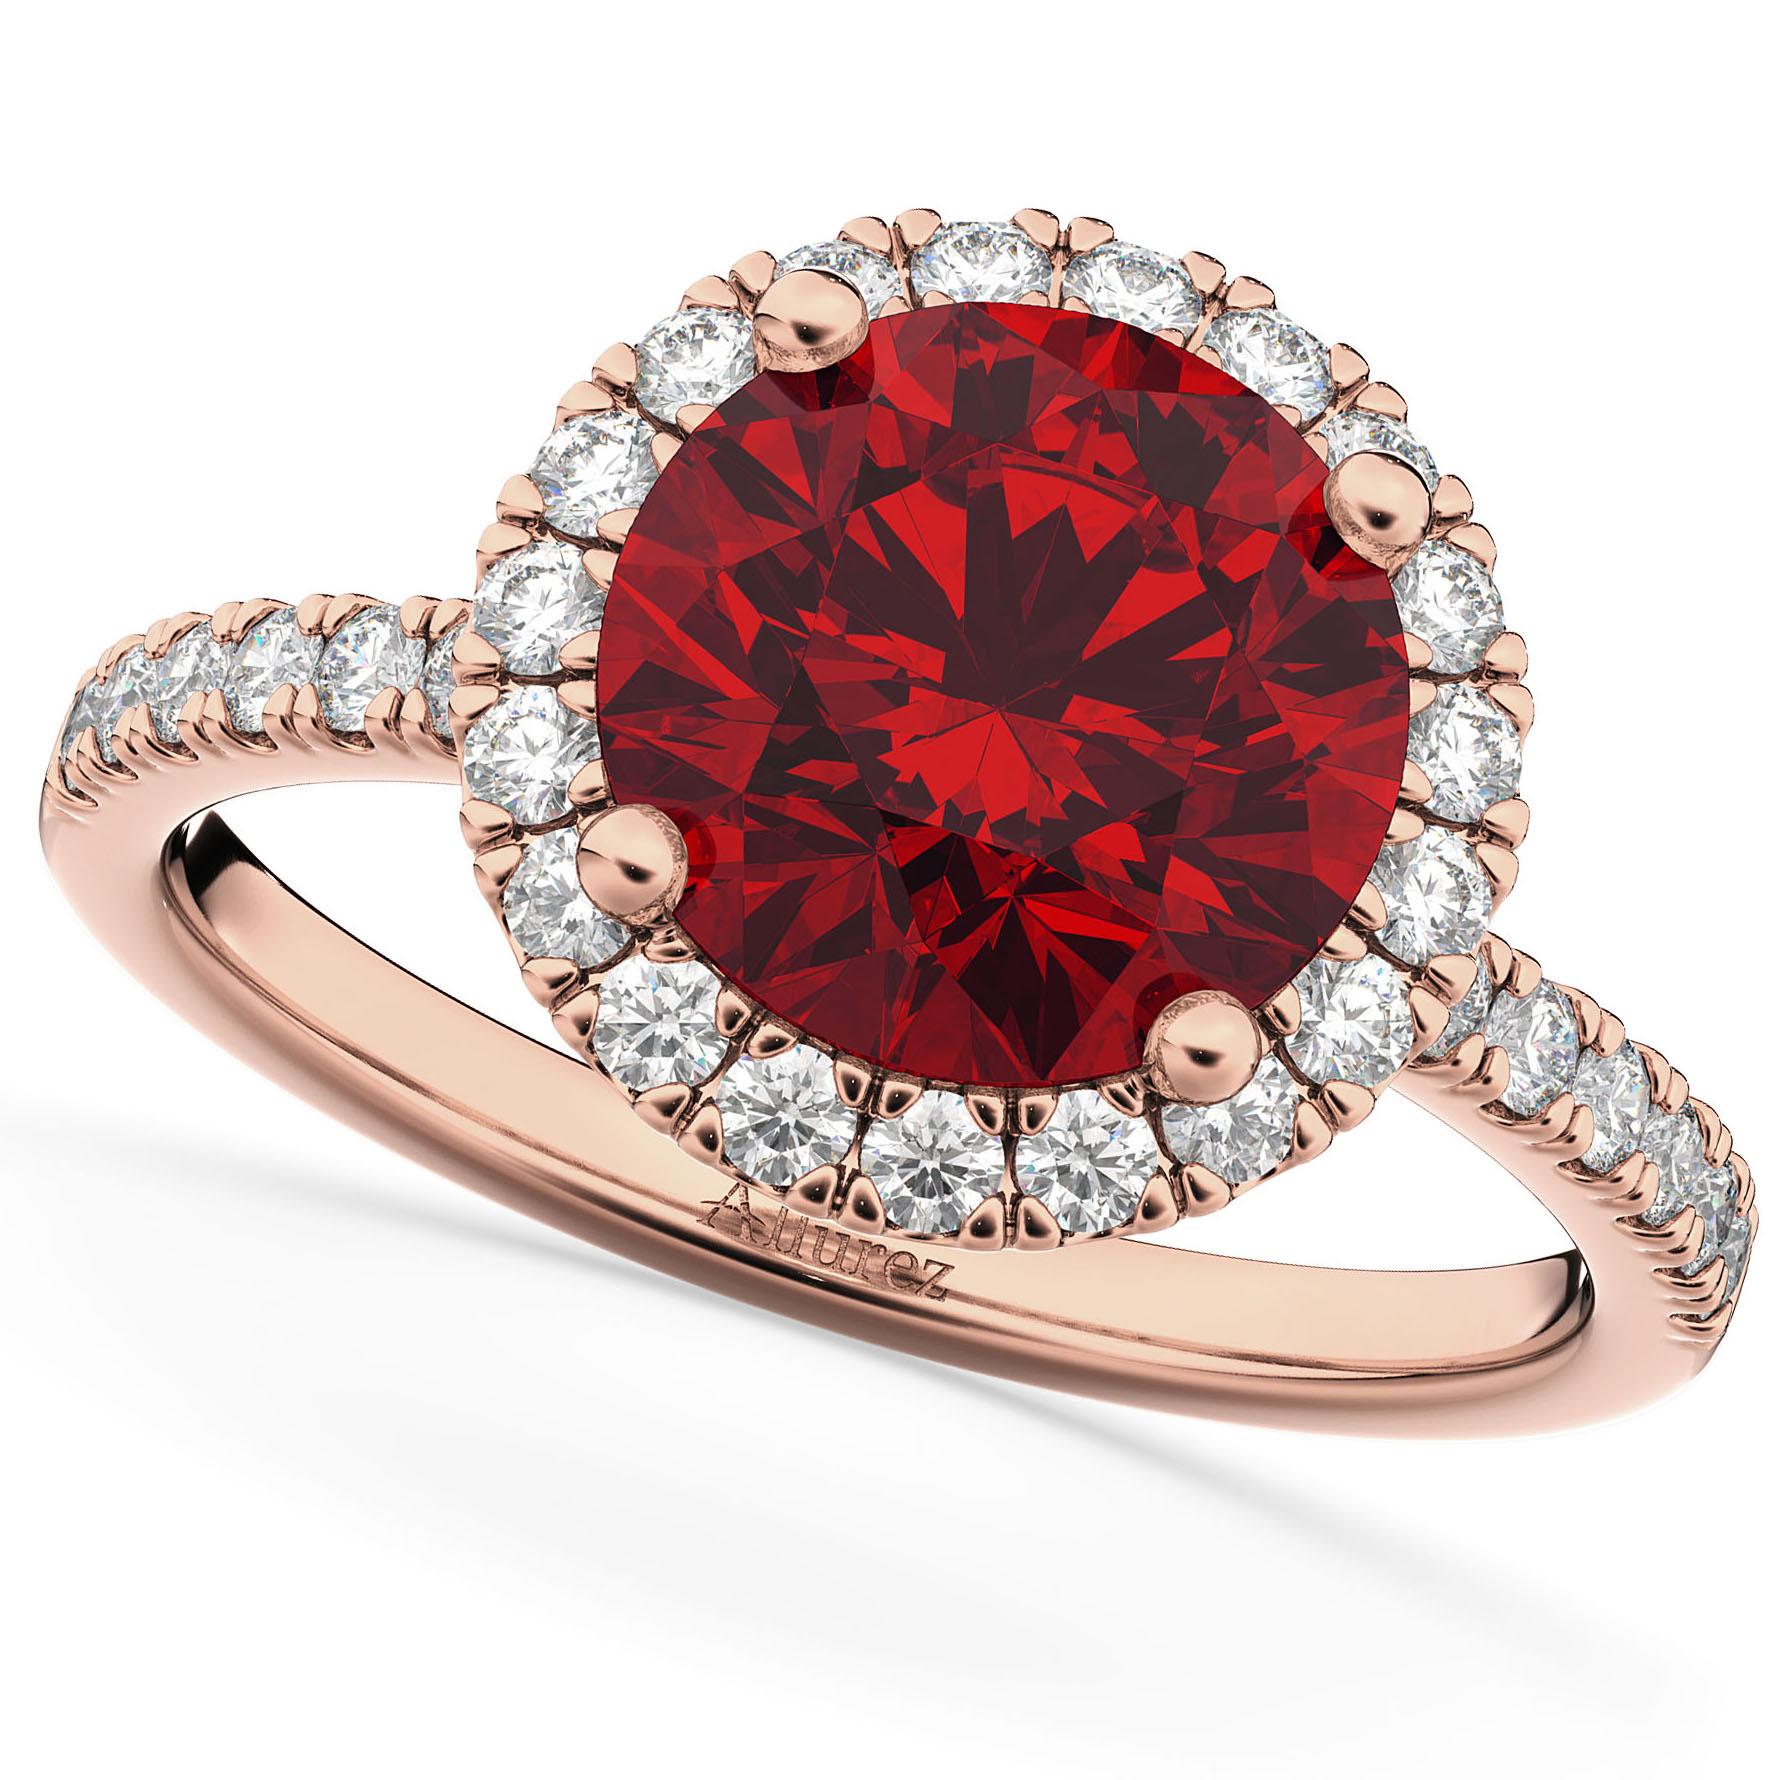 Halo Ruby & Diamond Engagement Ring 14K Rose Gold 2.80ct